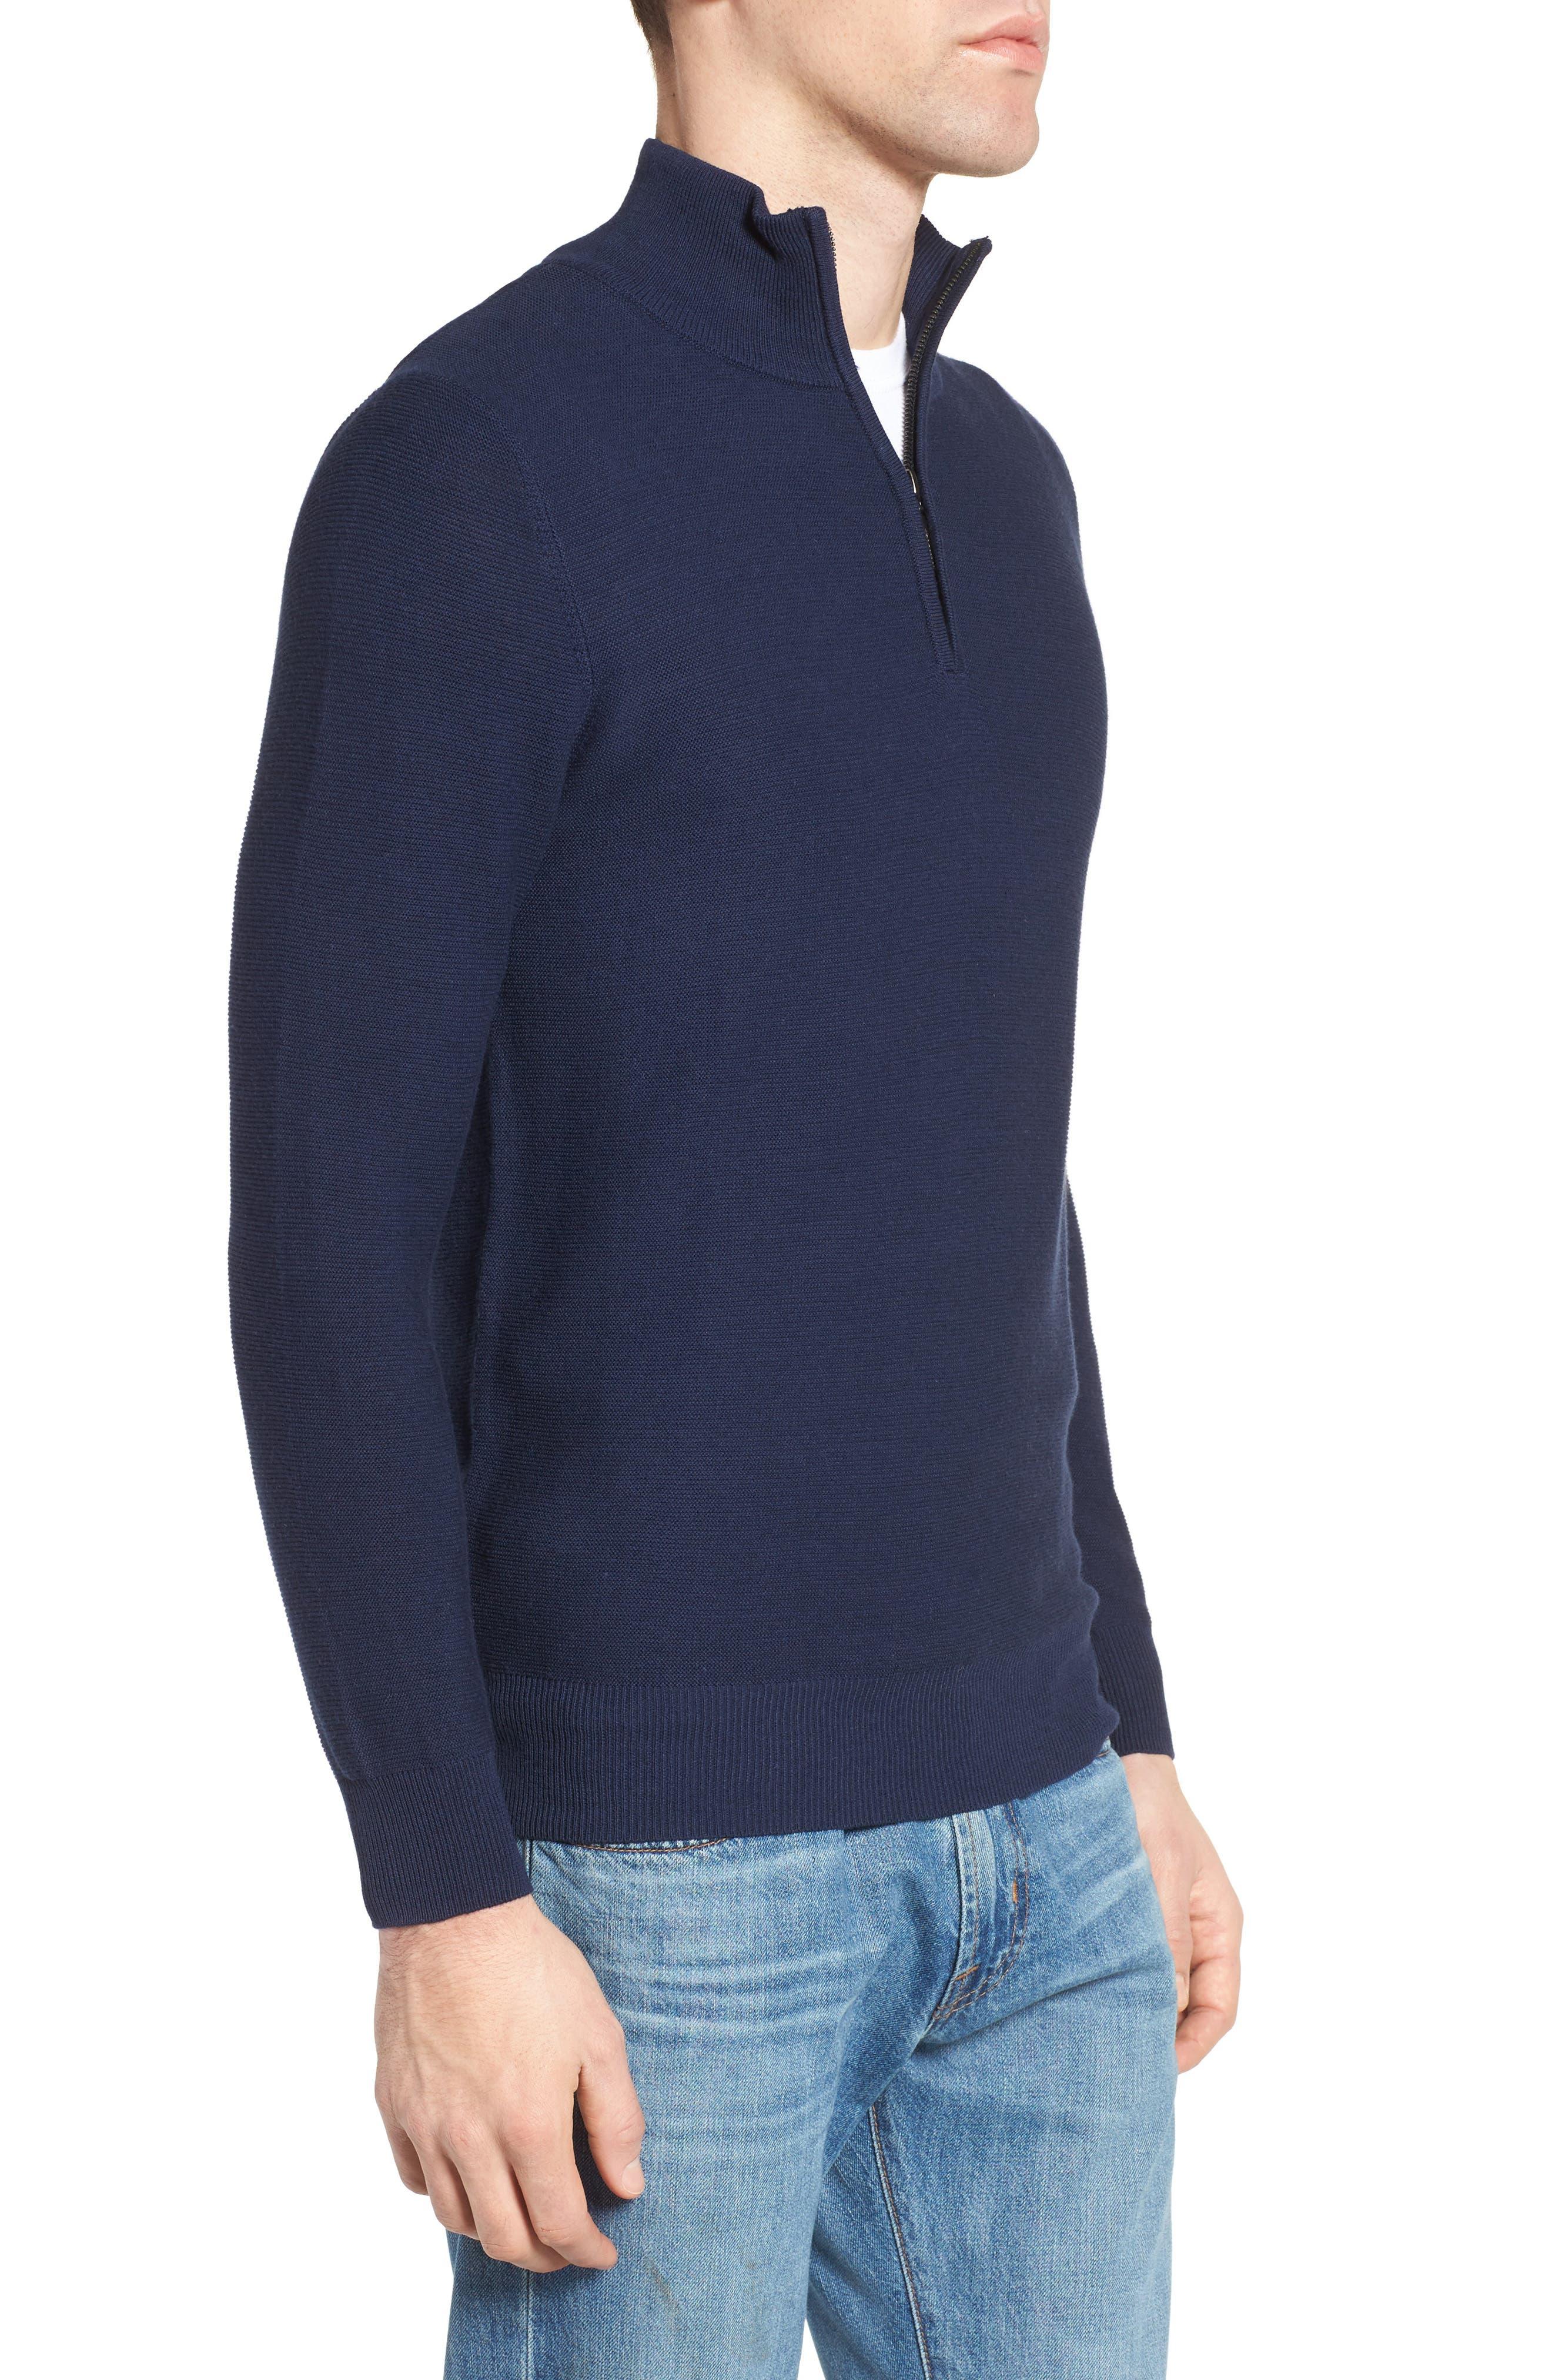 Quarter Zip Sweater,                             Alternate thumbnail 3, color,                             Navy